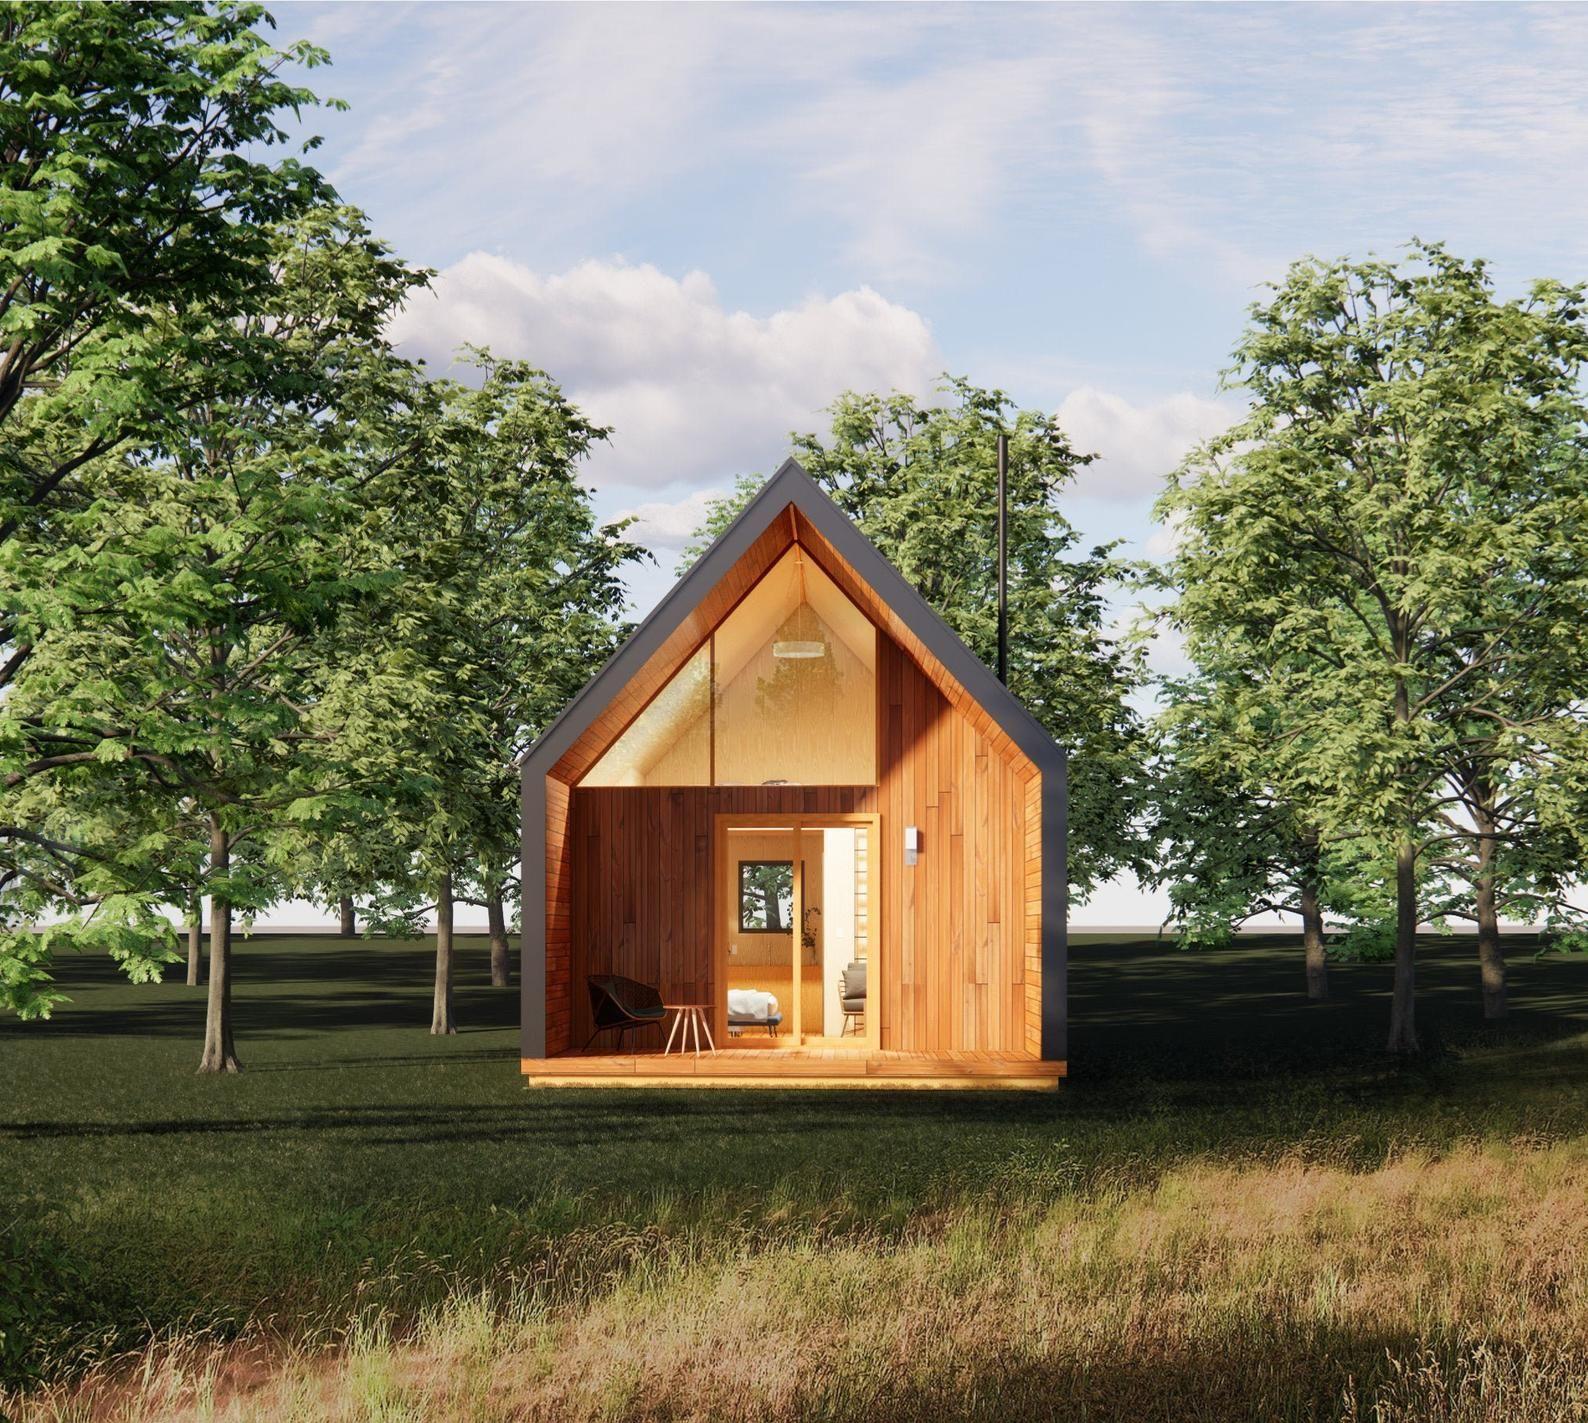 Modern ADU 19 x 28 Catskills Cabin Guest Tiny House Plans and Blueprints